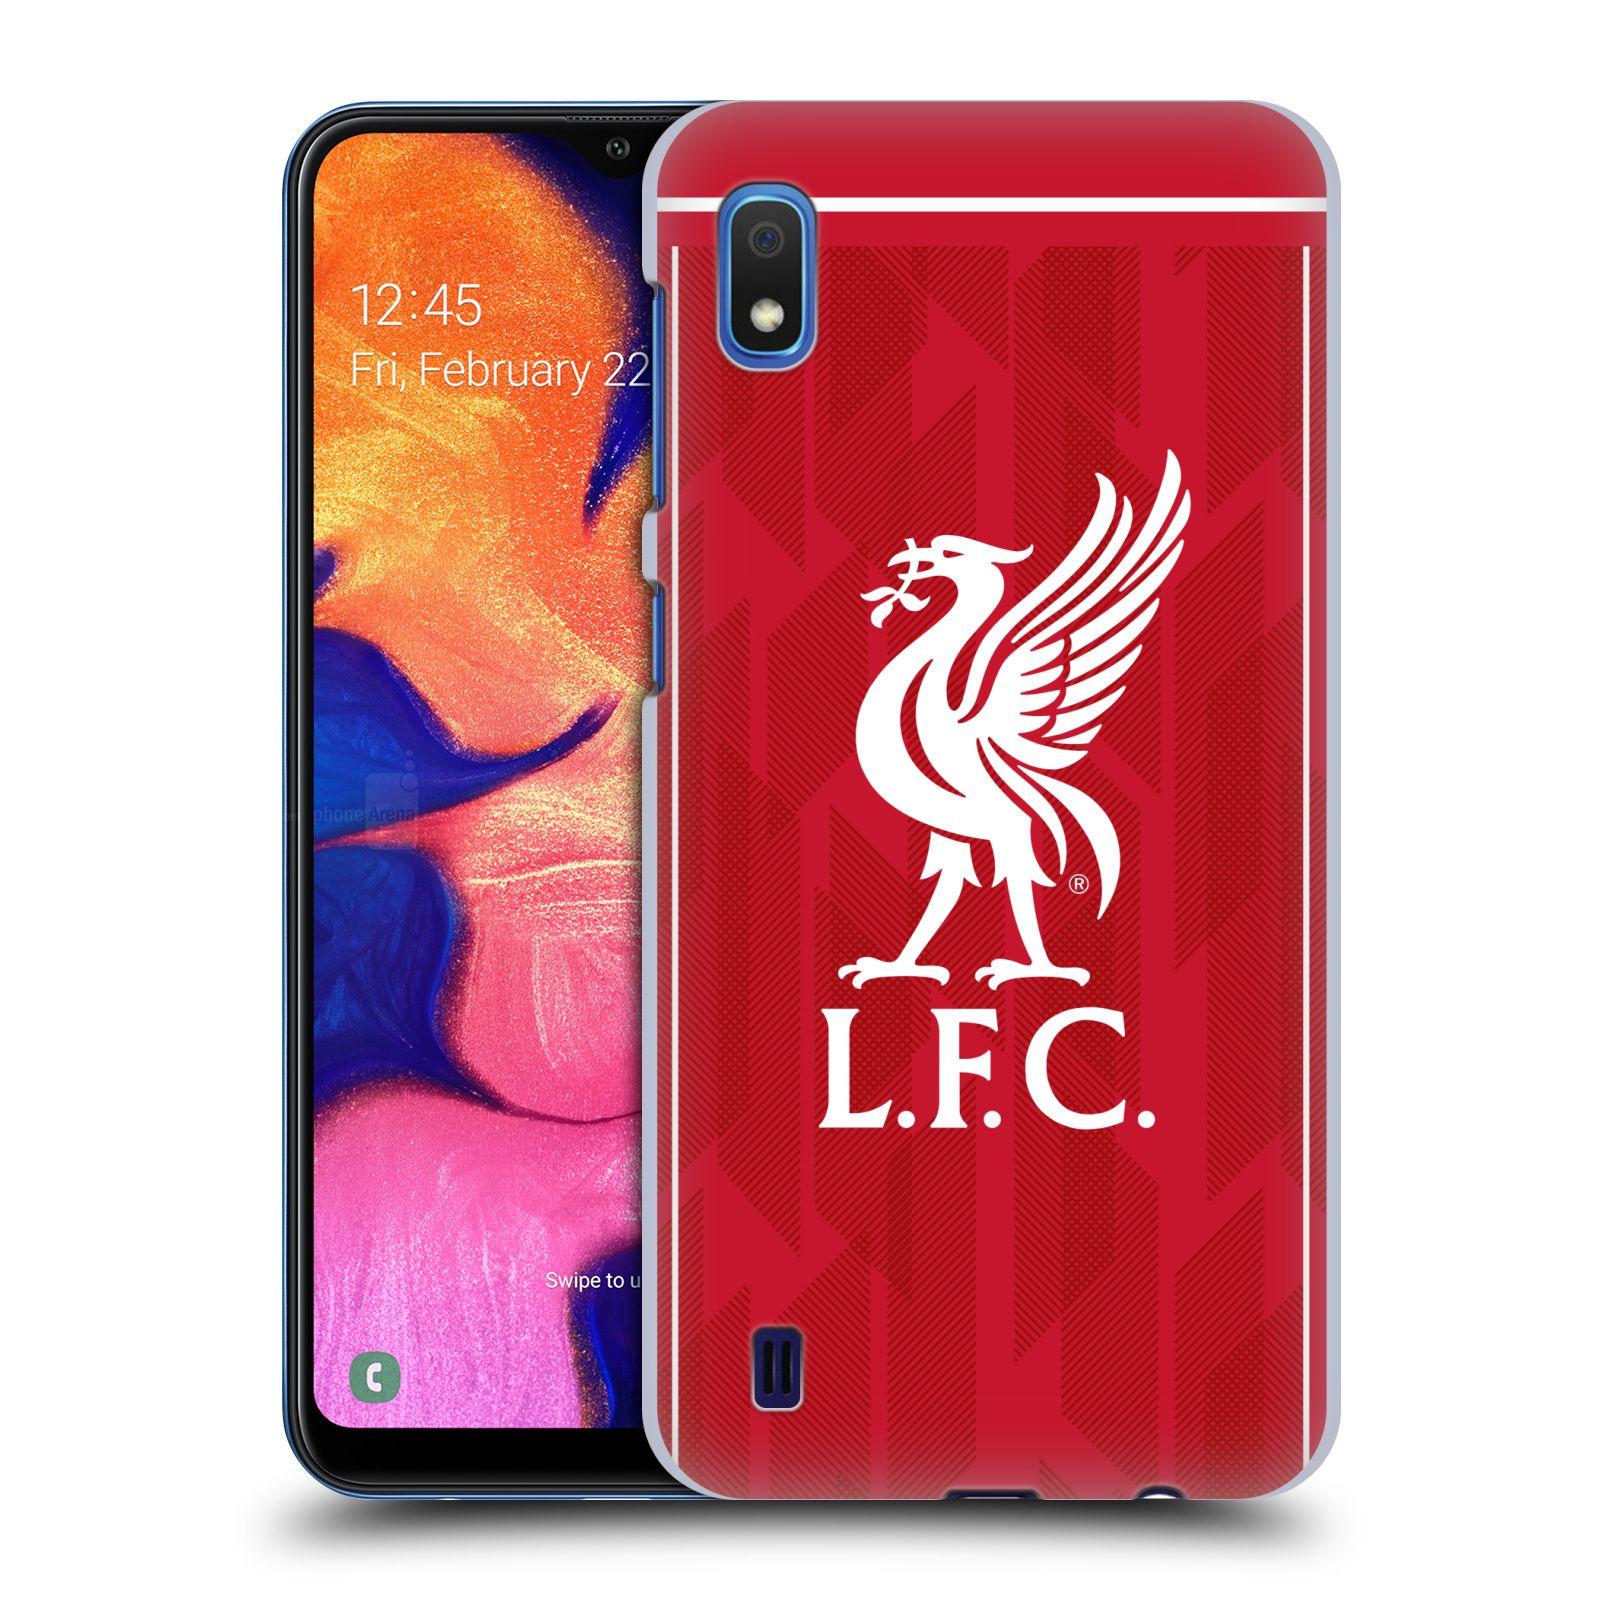 Plastové pouzdro na mobil Samsung Galaxy A10 - Head Case - Liverpool FC - L.F.C. Home kit